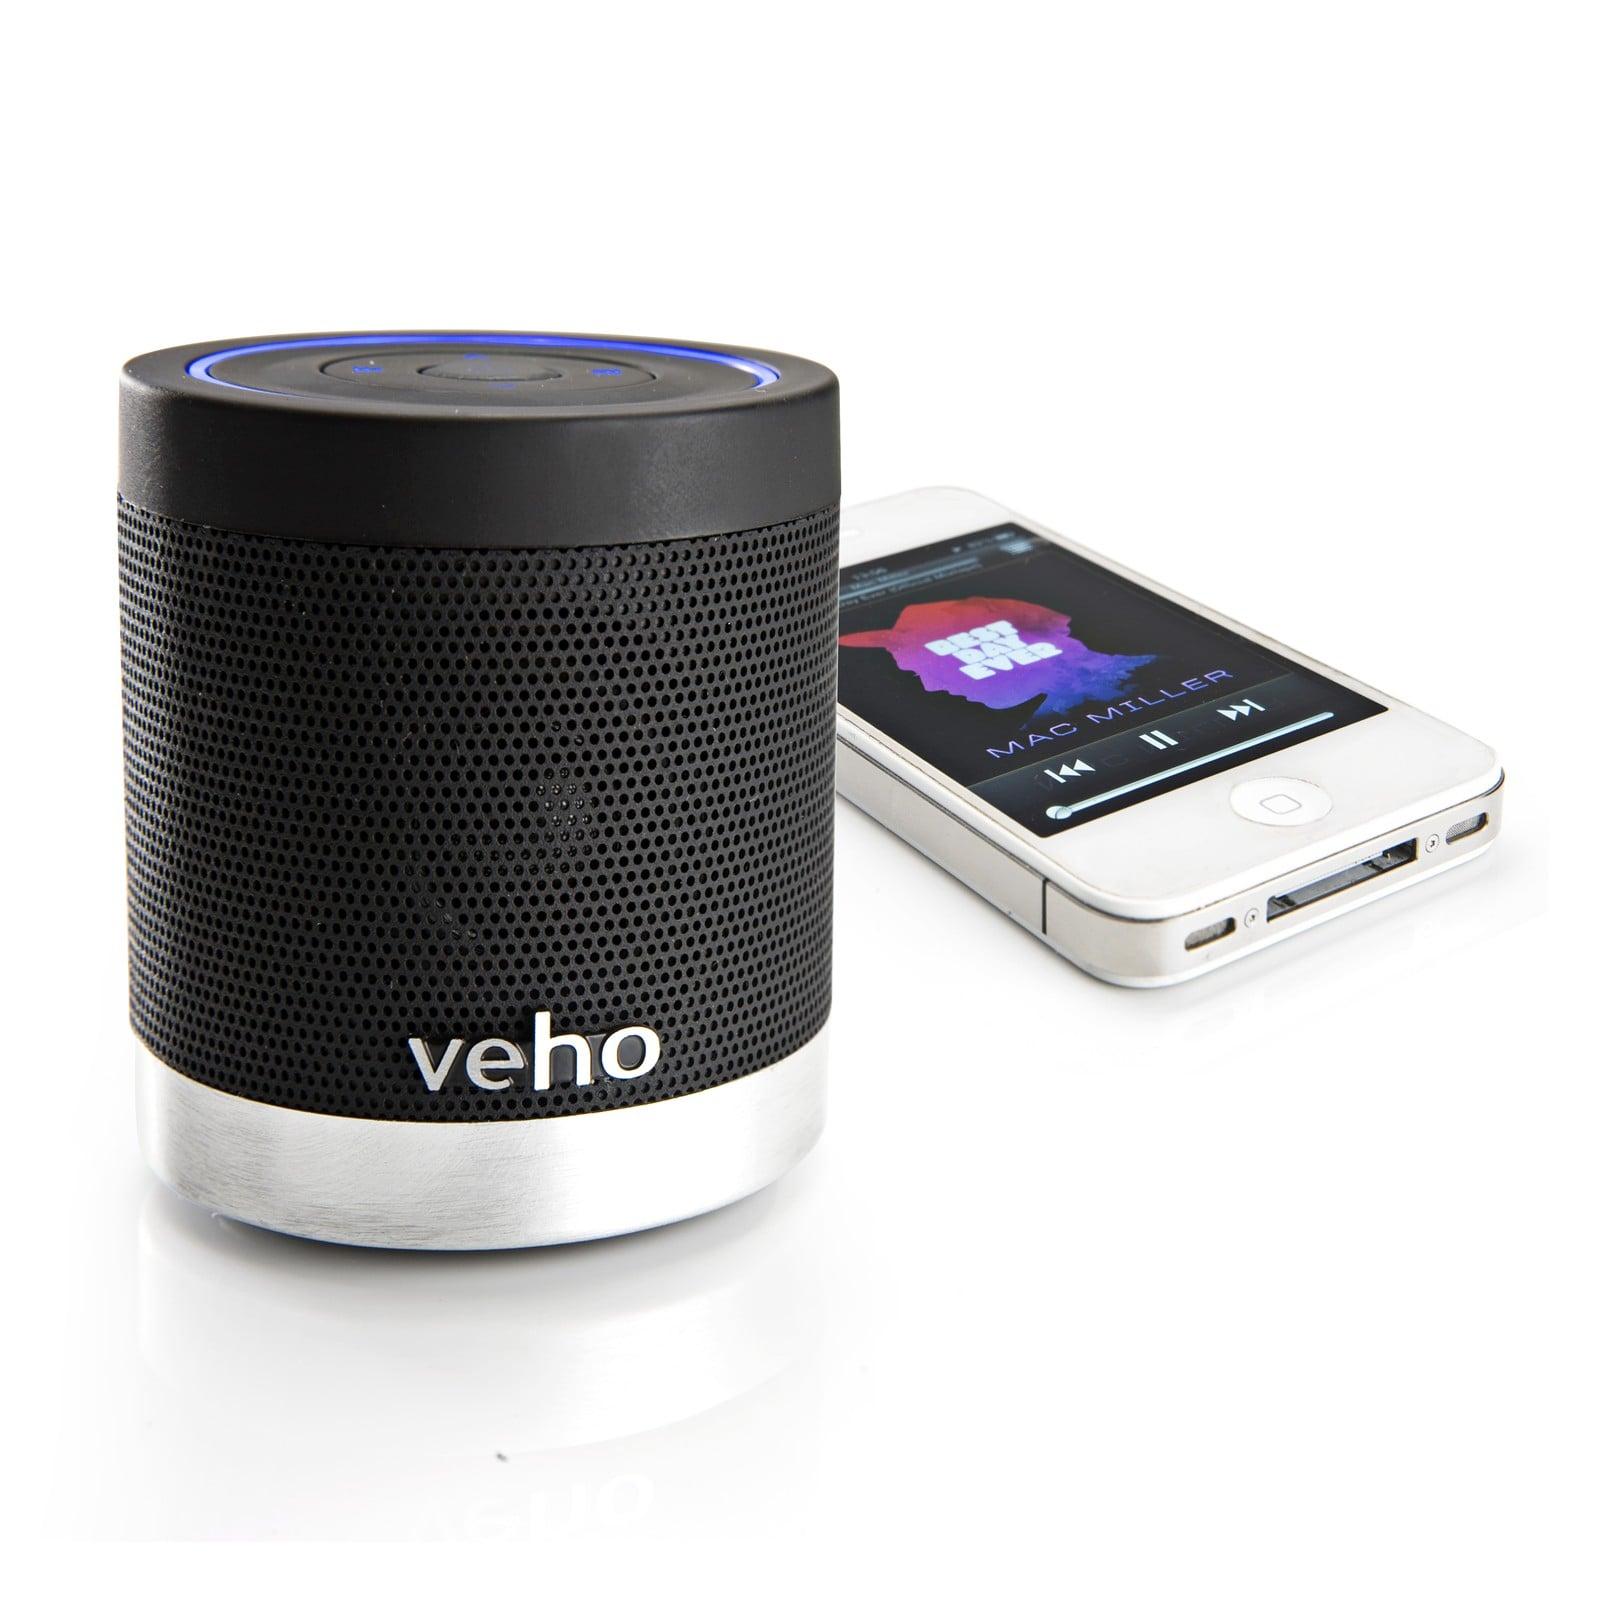 test enceinte bluetooth veho 360 m4 pour iphone ipad. Black Bedroom Furniture Sets. Home Design Ideas